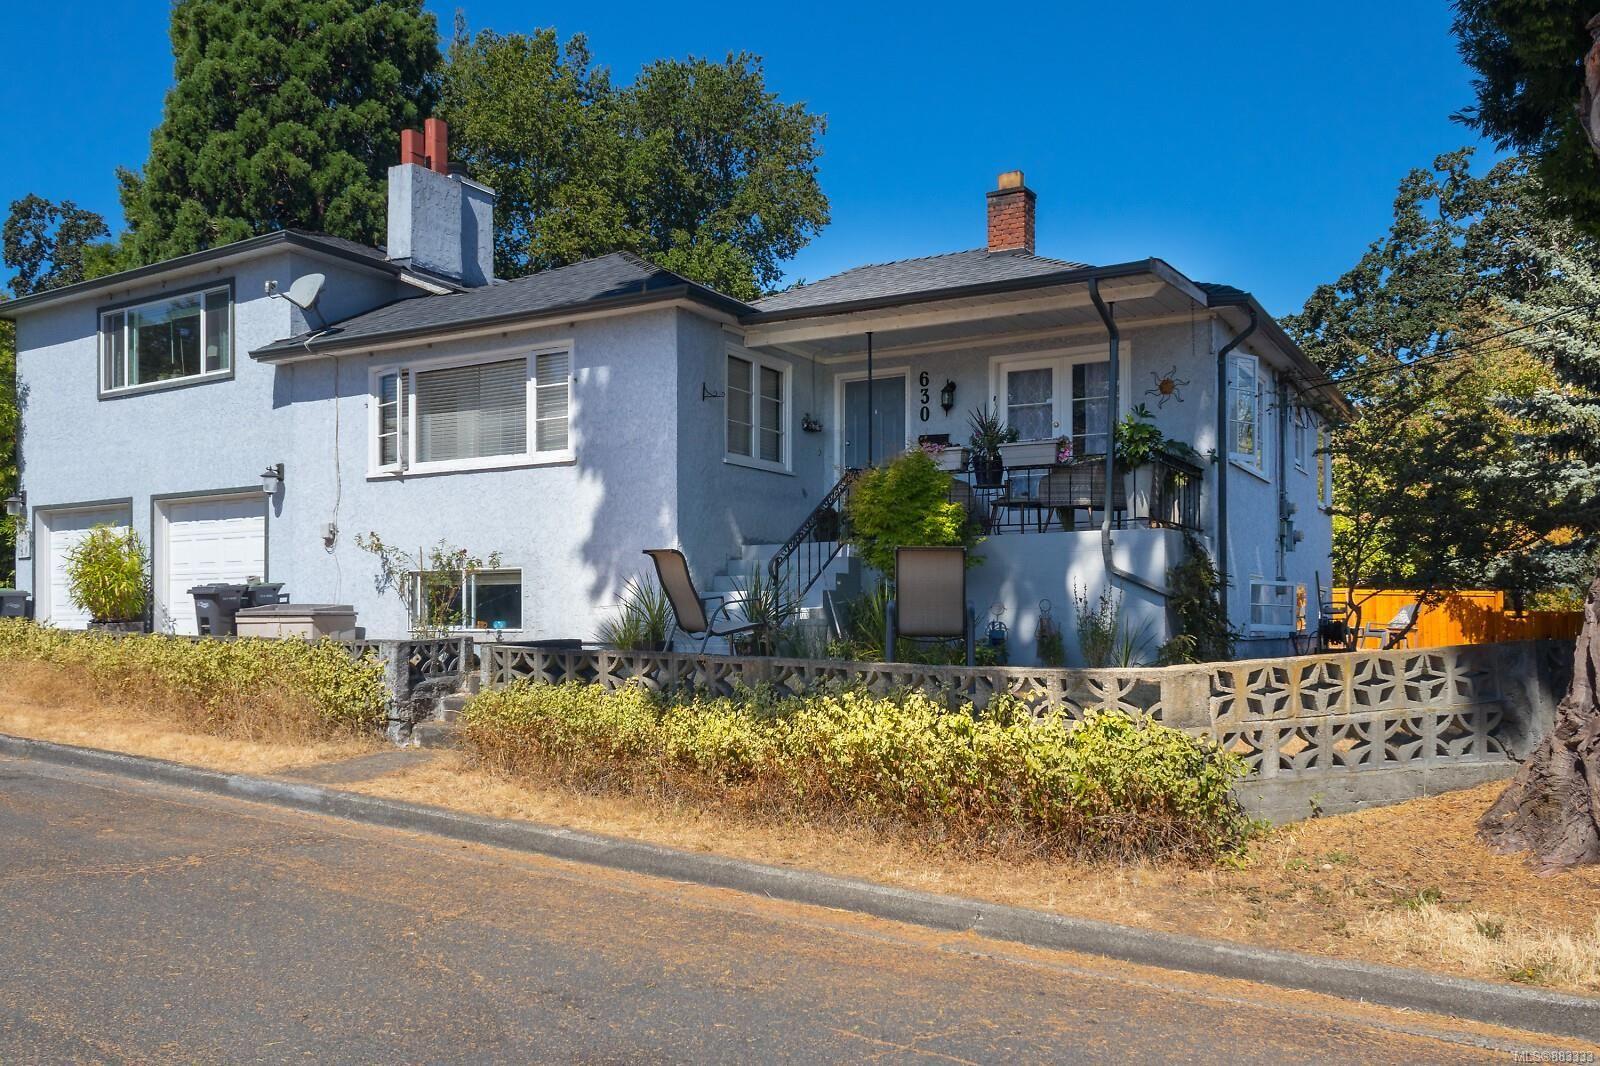 Main Photo: 630 Bryden Crt in : Es Old Esquimalt Half Duplex for sale (Esquimalt)  : MLS®# 883333